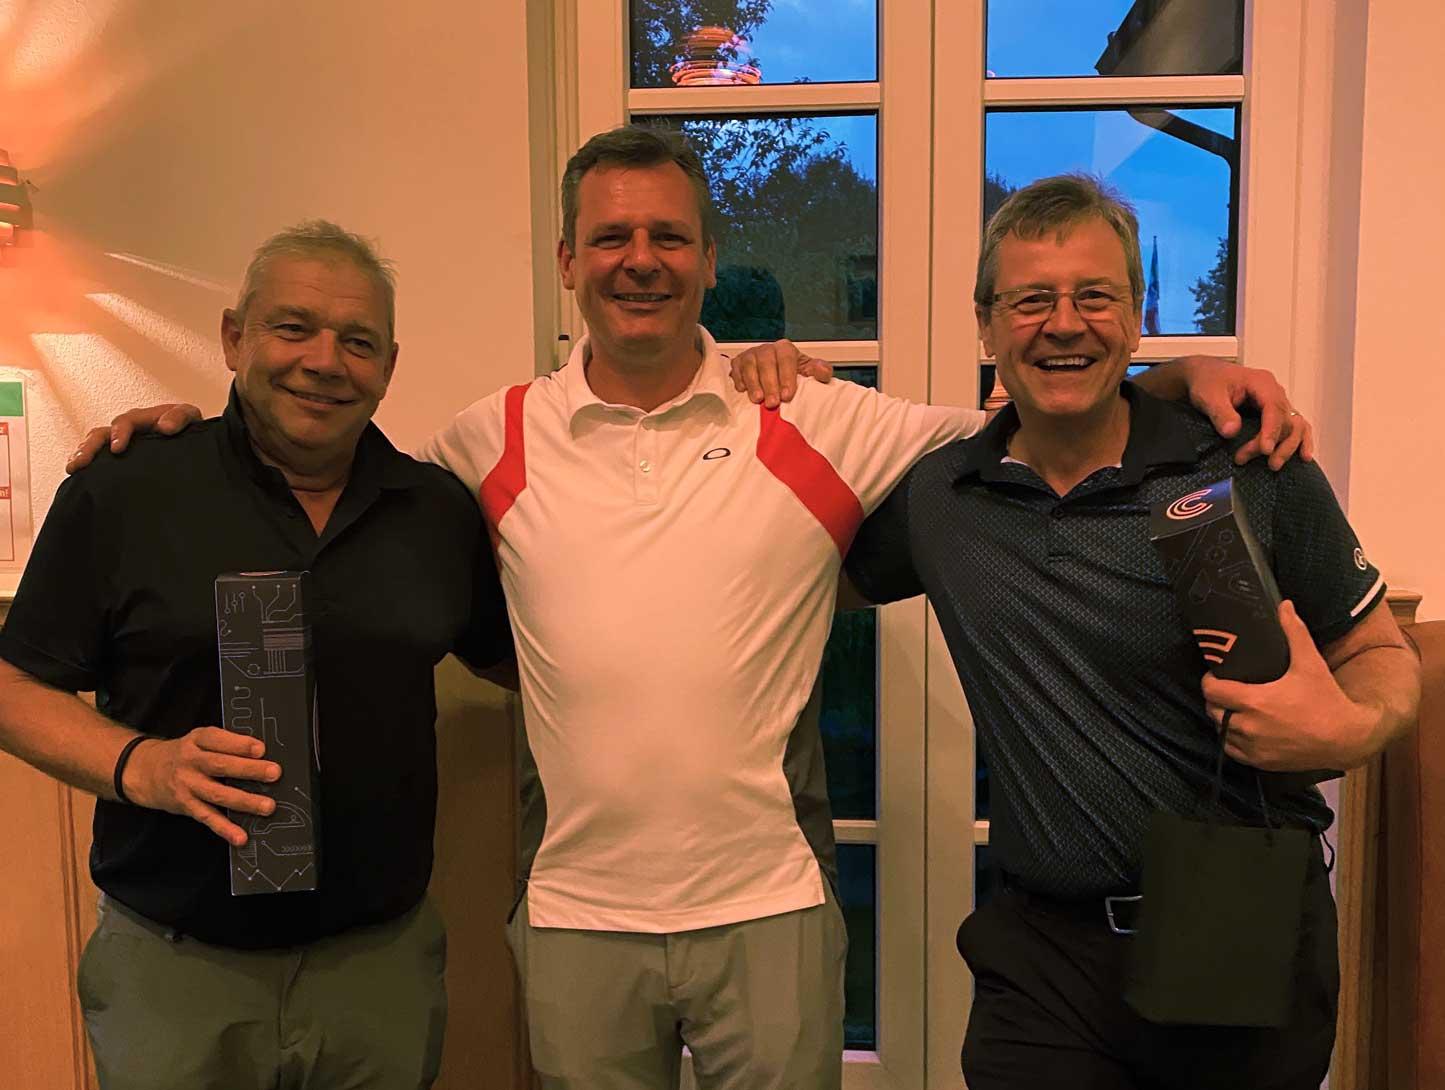 210930_cocus_Blog_Event_Golf11